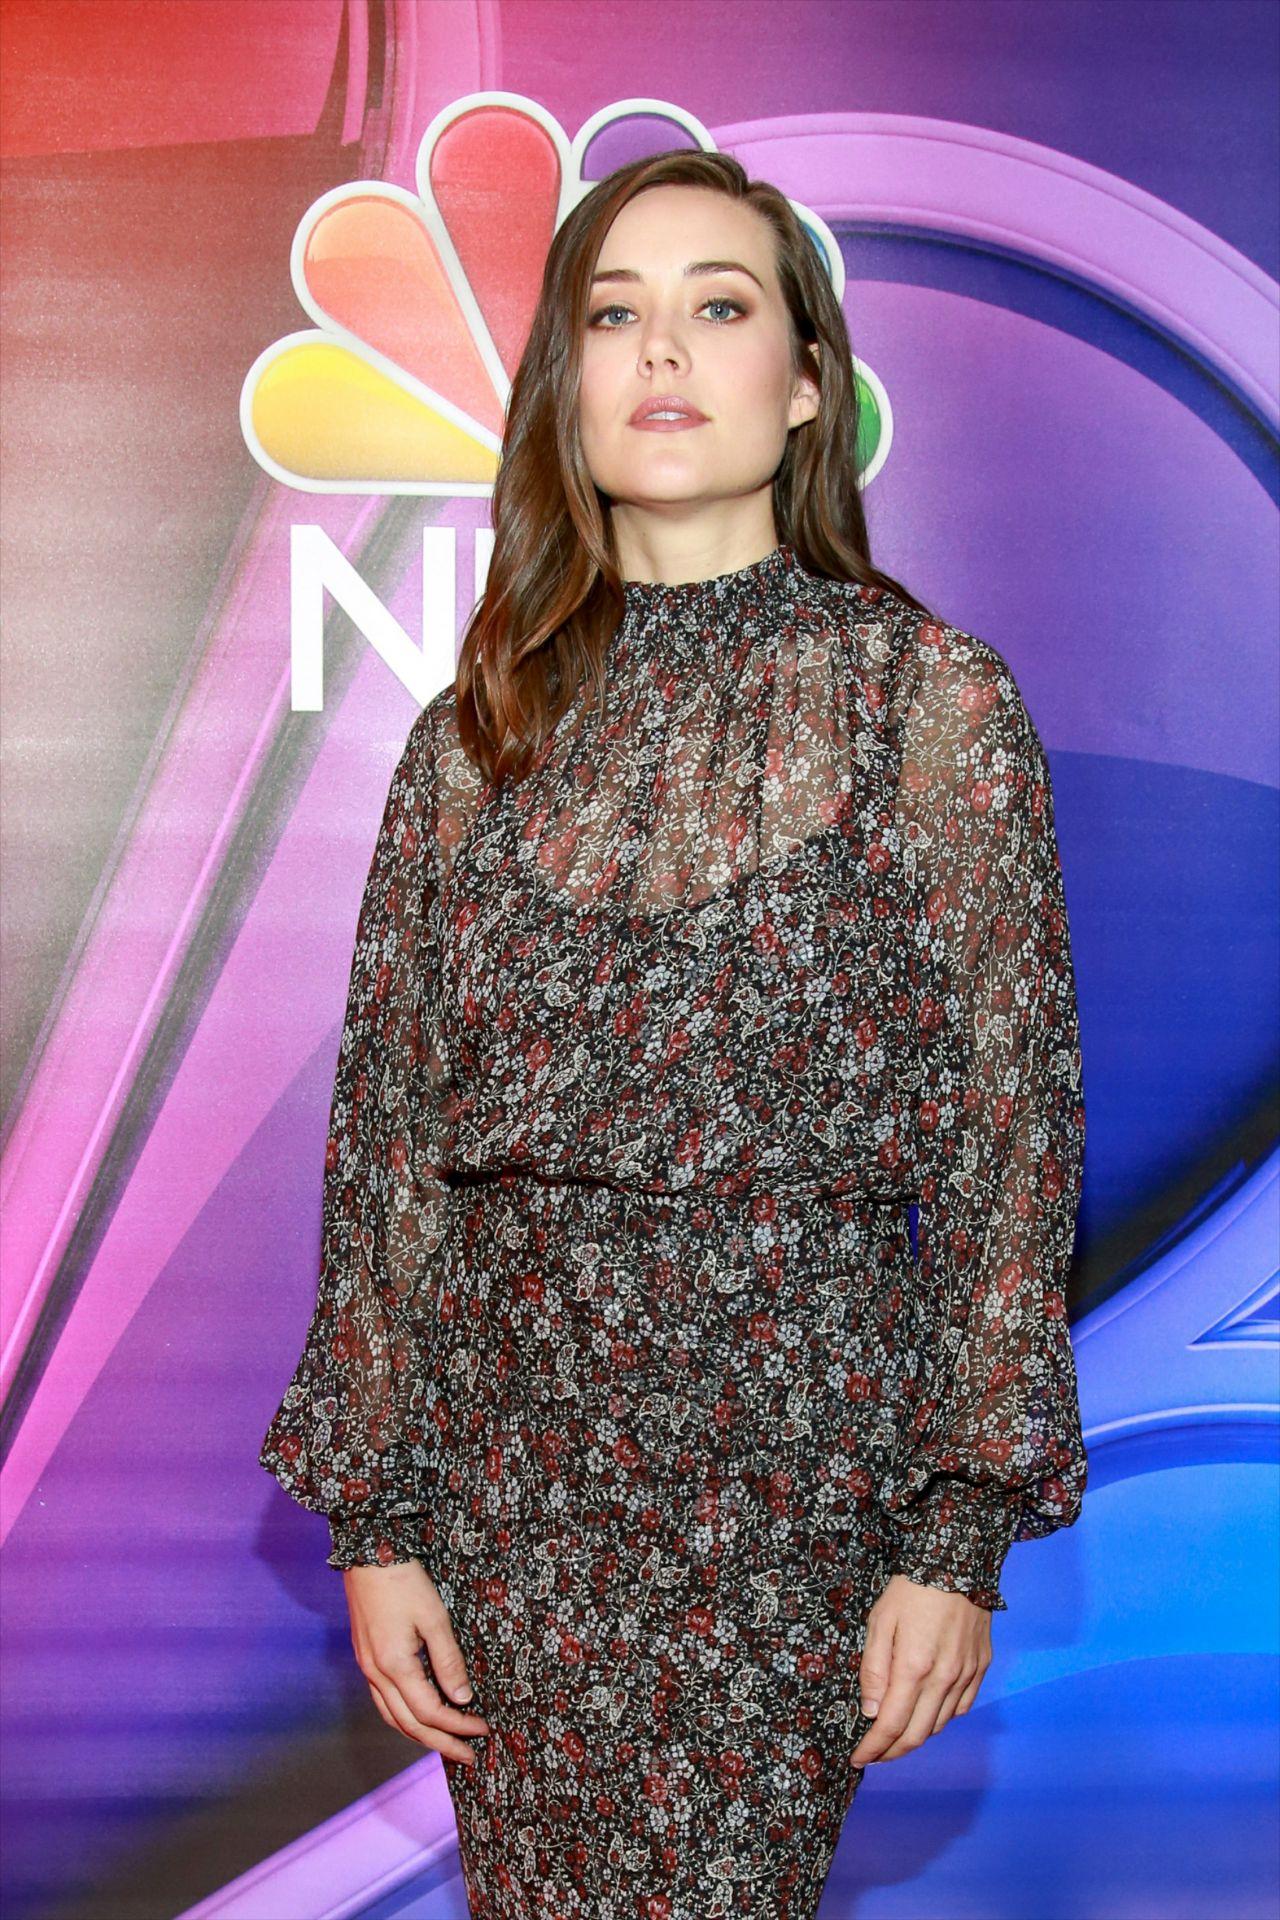 Megan Boone Nbc S Ny Mid Season Press Junket 01 24 2019